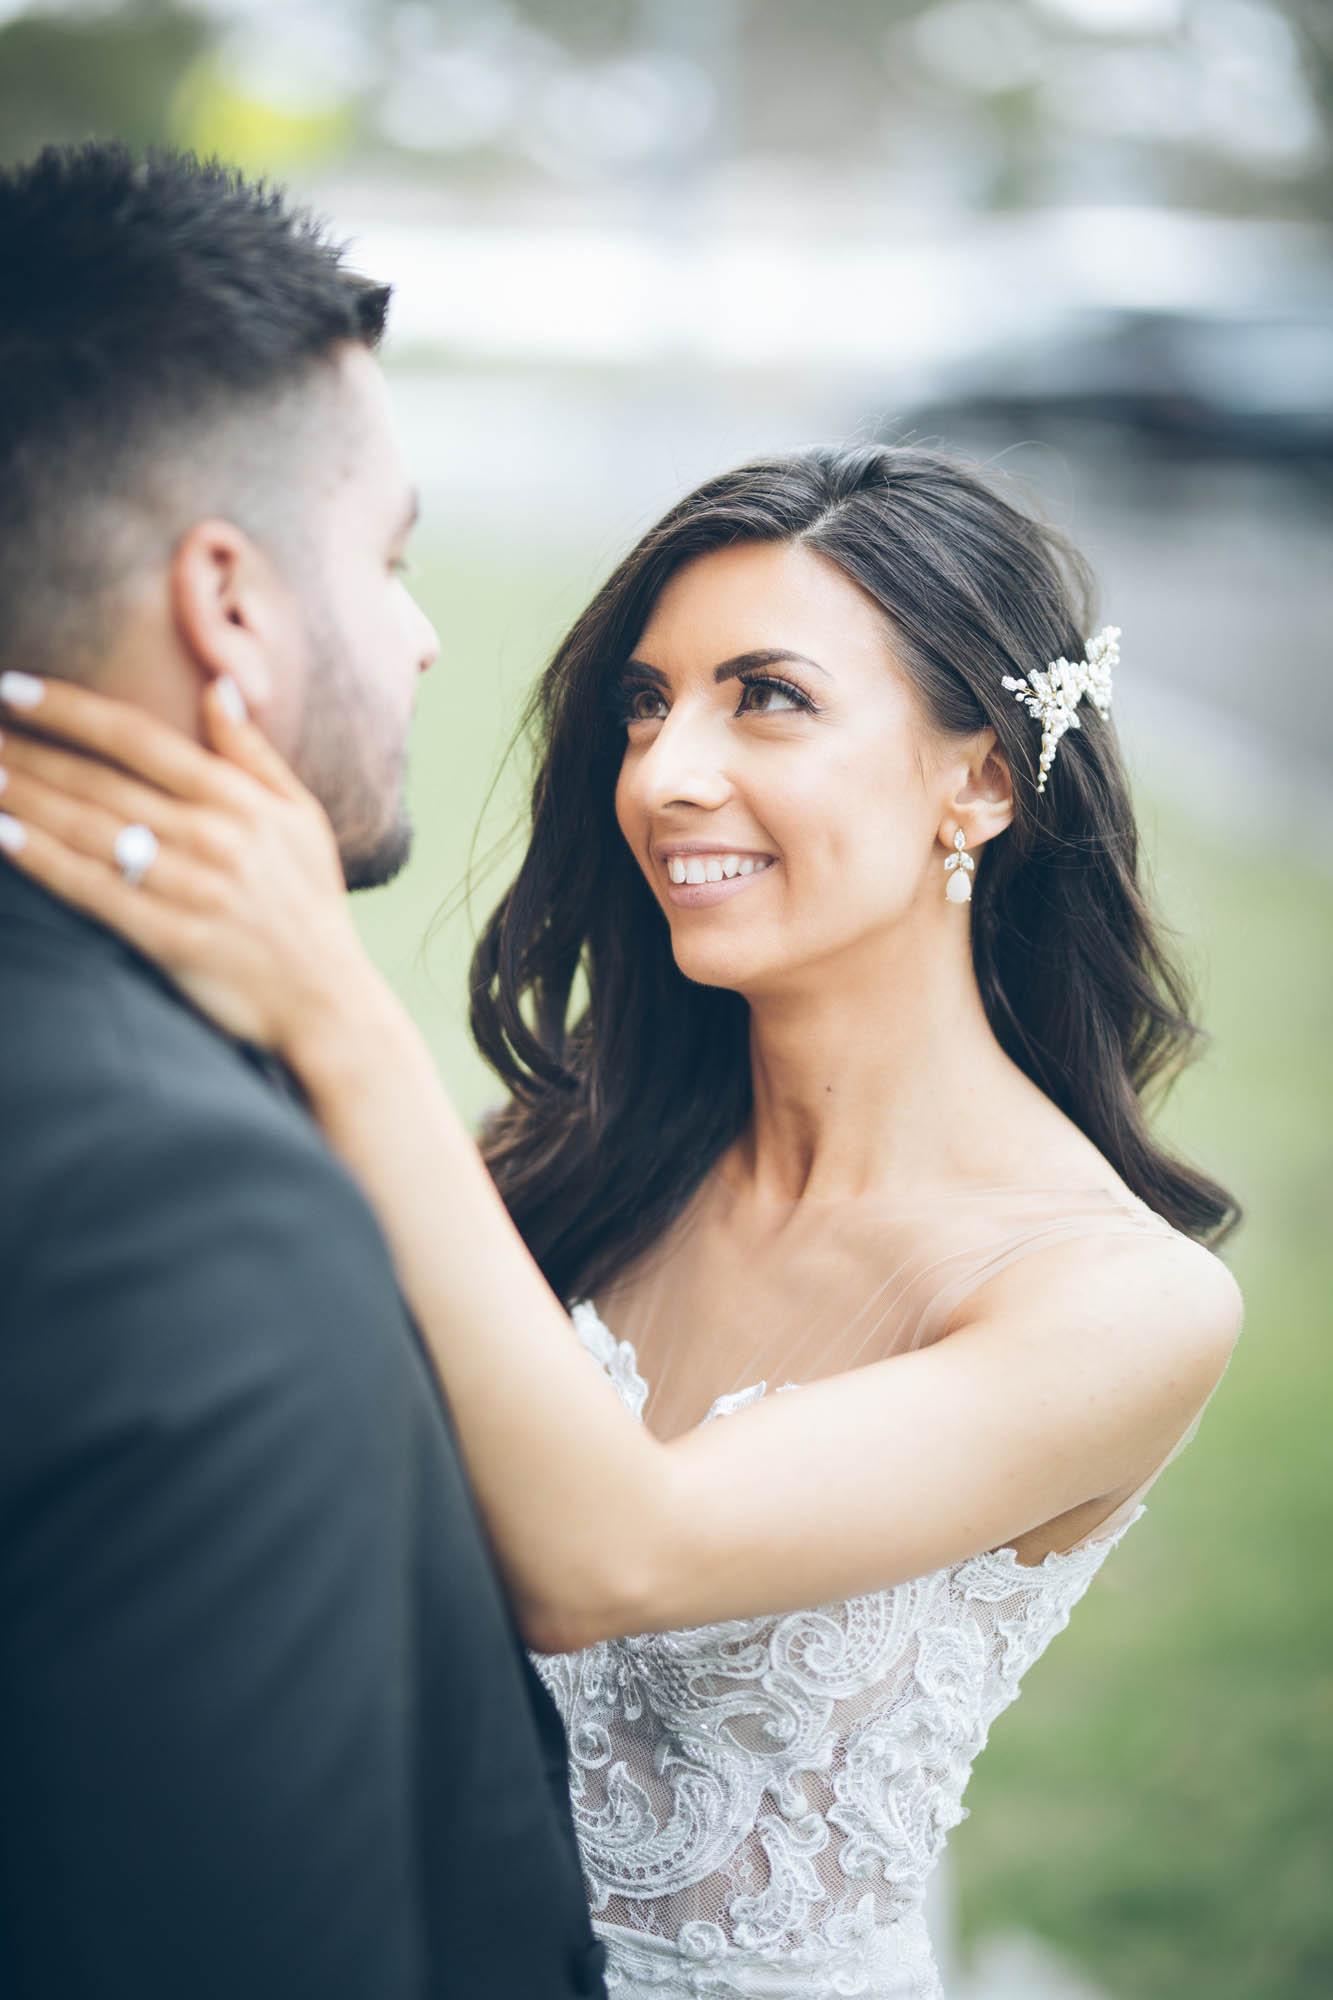 MacDougall-Photography-Sydney-Wedding-Photographers-53.jpg